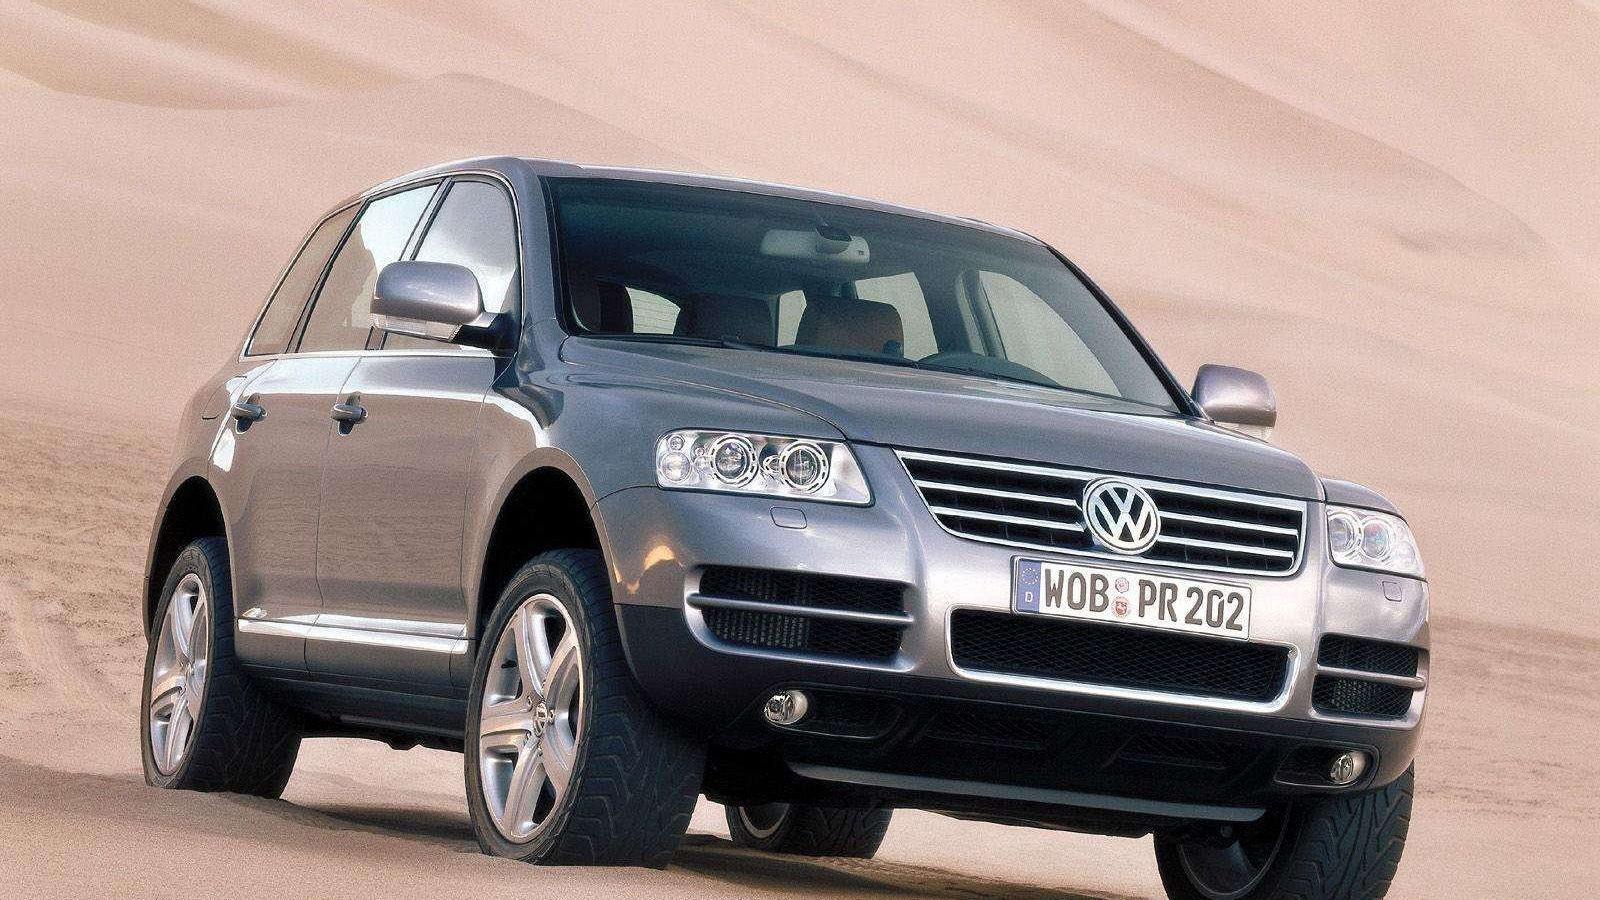 Volkswagen Touareg 2002; źródło: wachidan.blogspot.com